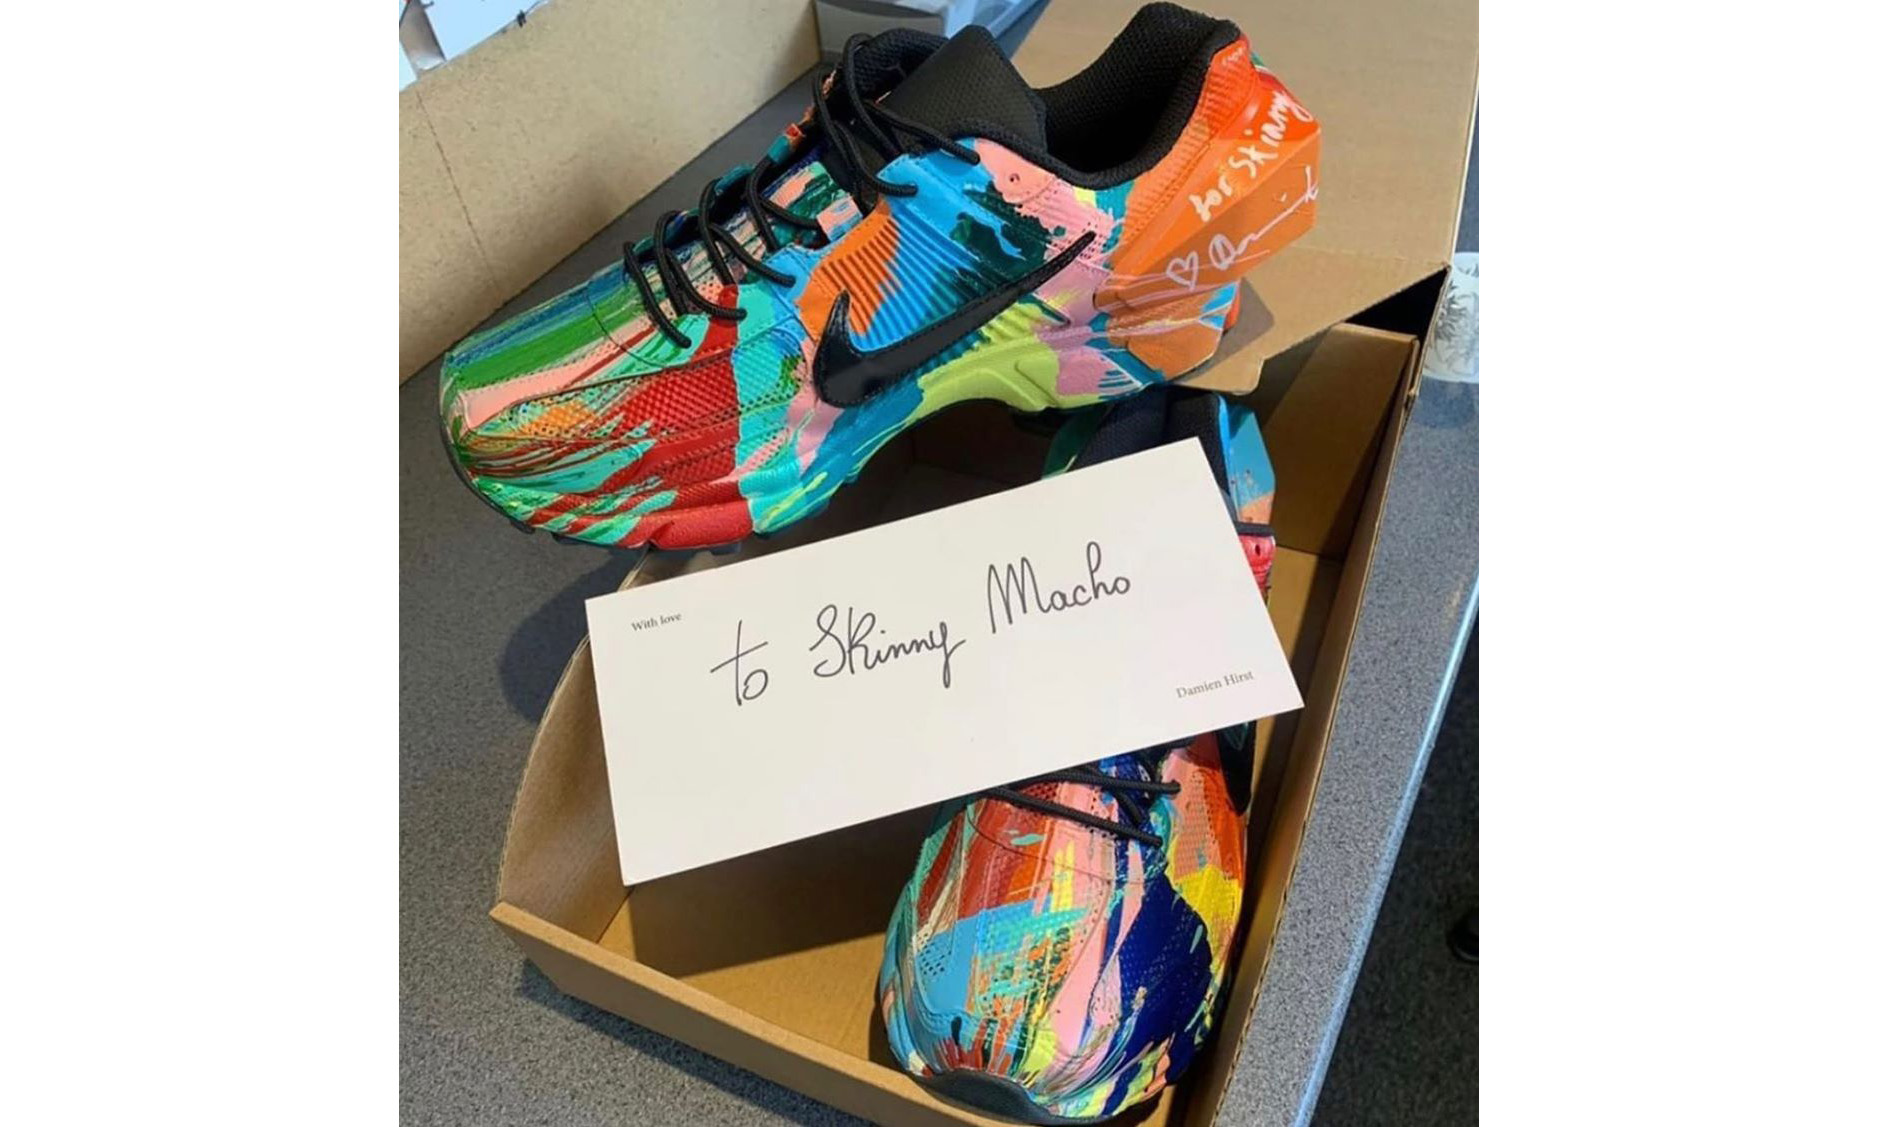 Damien Hirst 打造了一双极为夸张的 ACW* x Nike Zoom Vomero +5